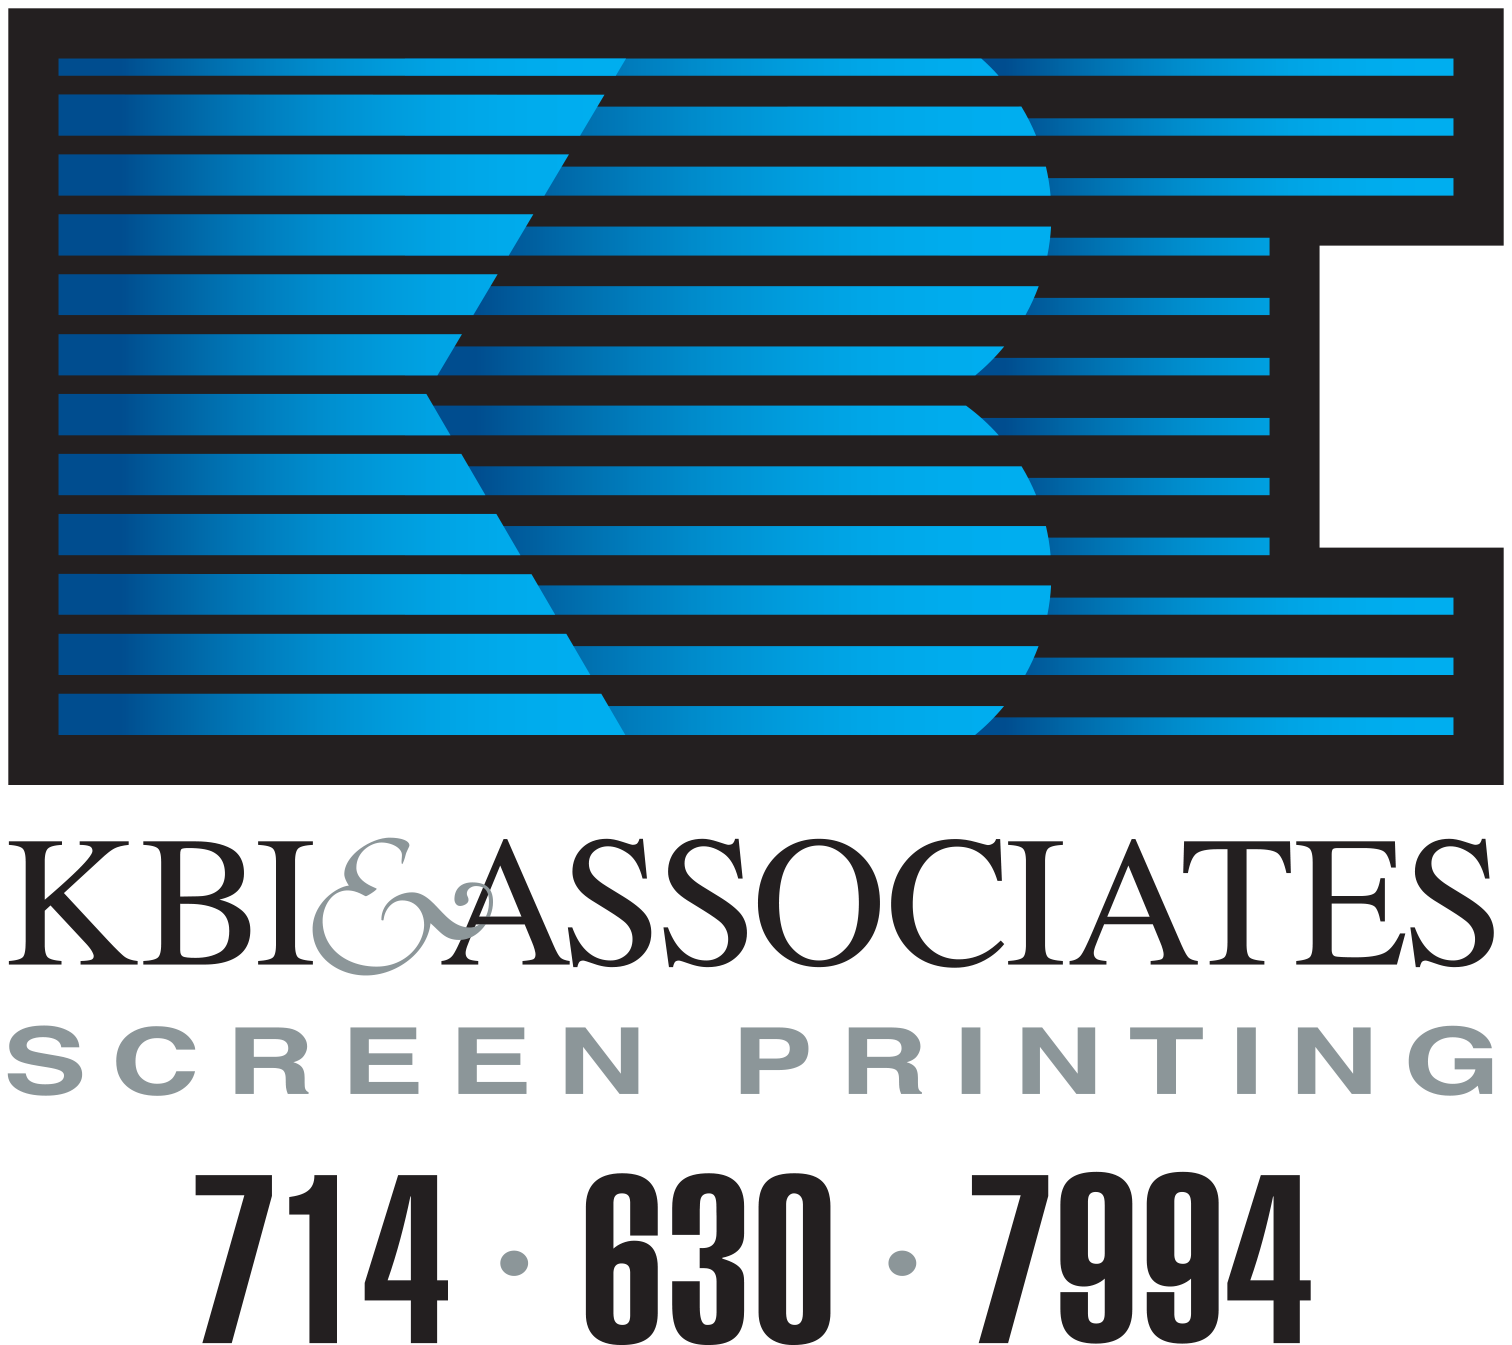 KBI Screen Printing